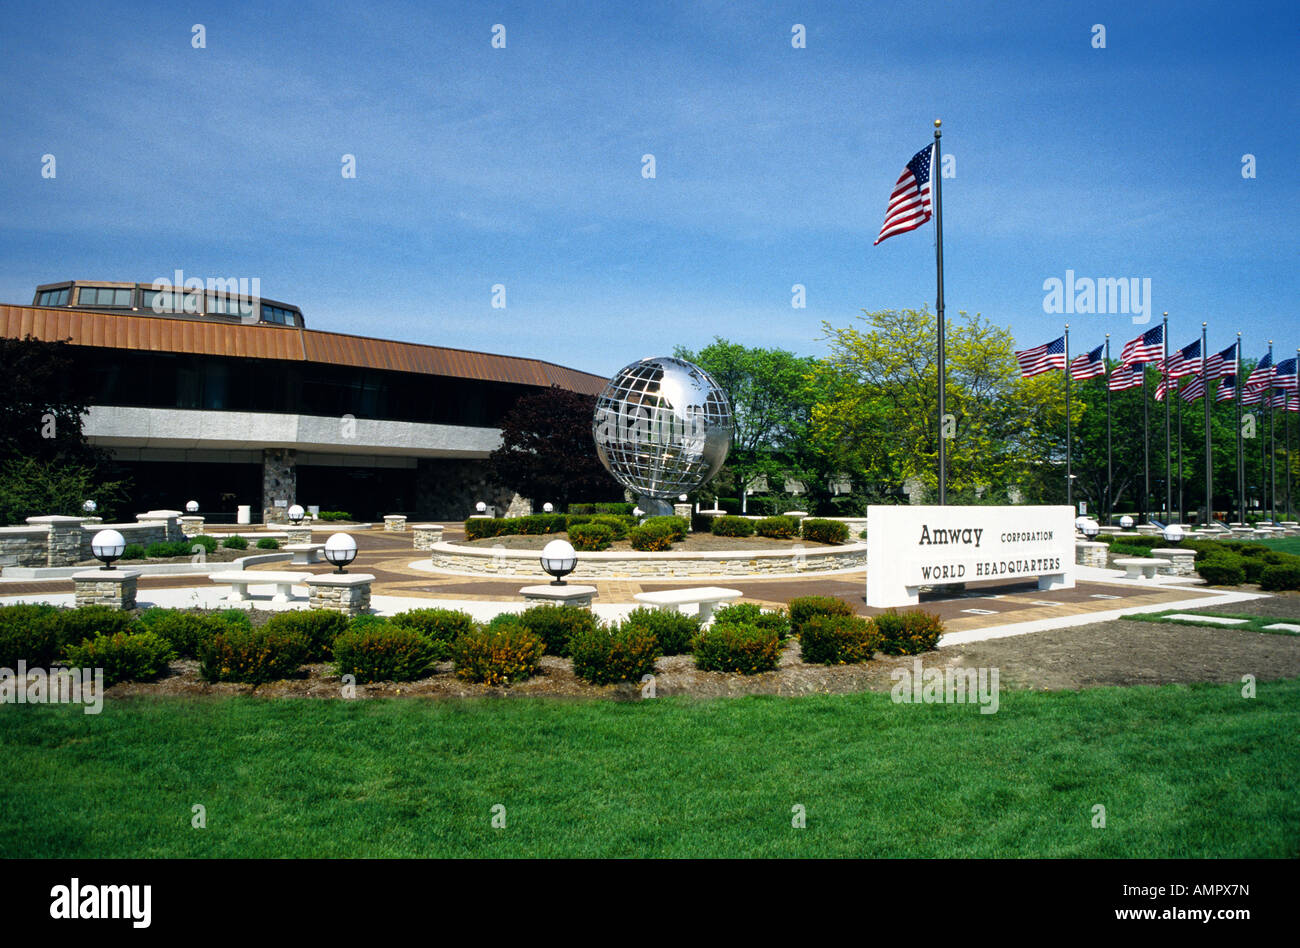 Amway Corporation World Headquarters in Ada, Michigan Stock Photo - Alamy